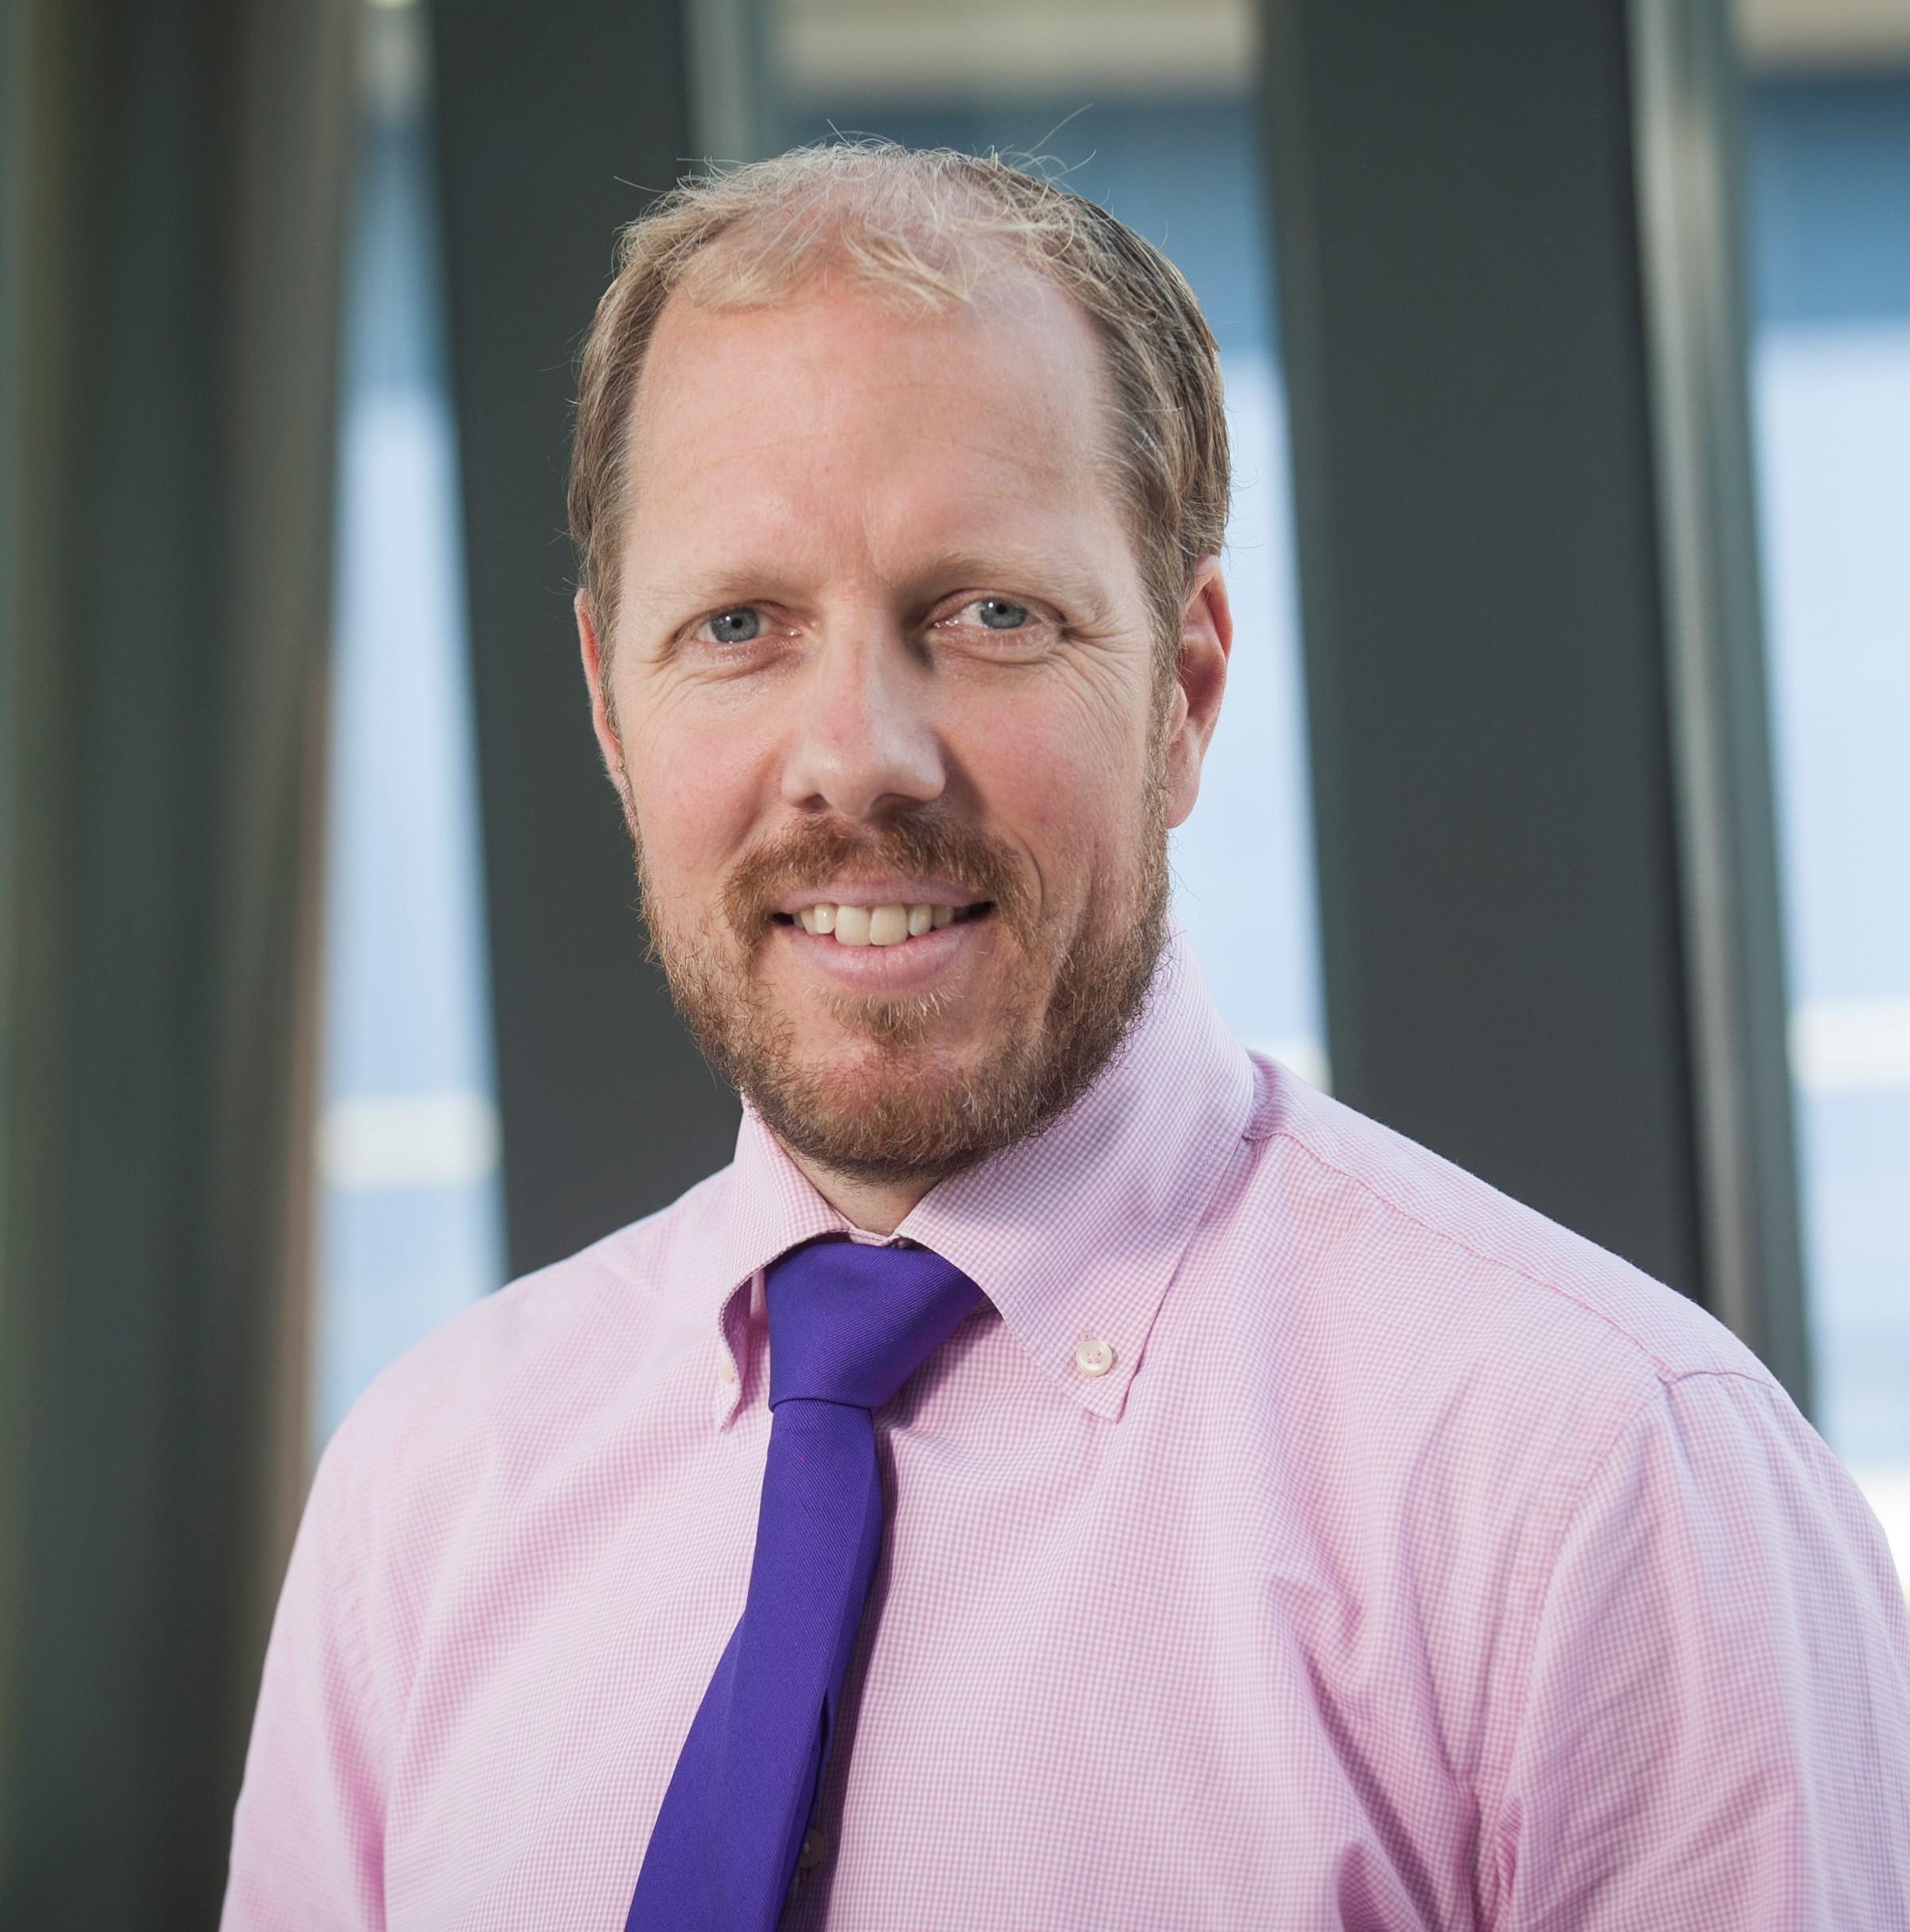 Eric van der Veer, PhD